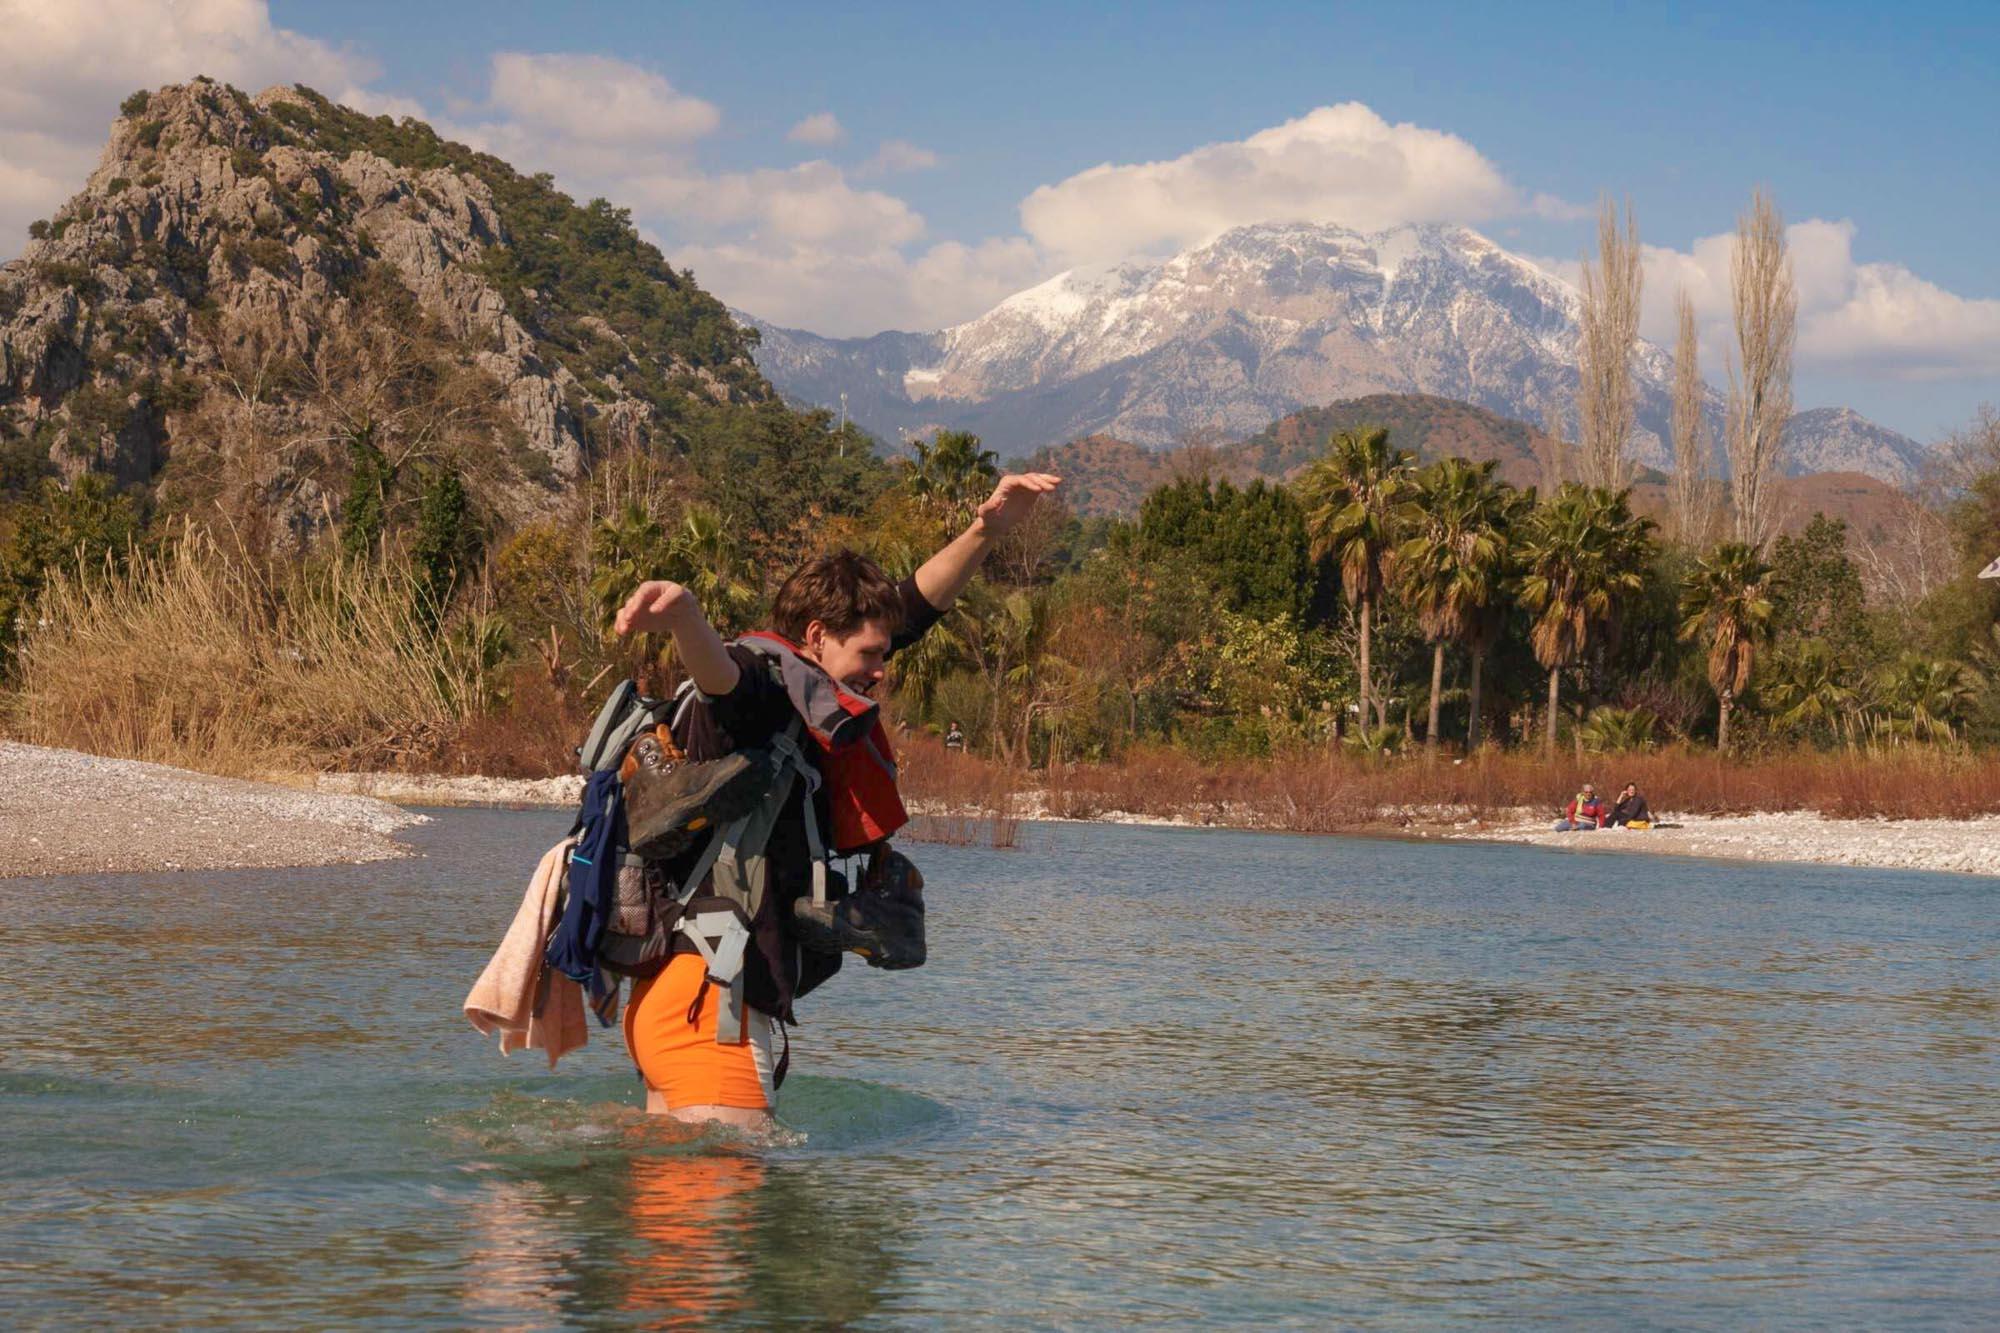 Cesta po Nepálu